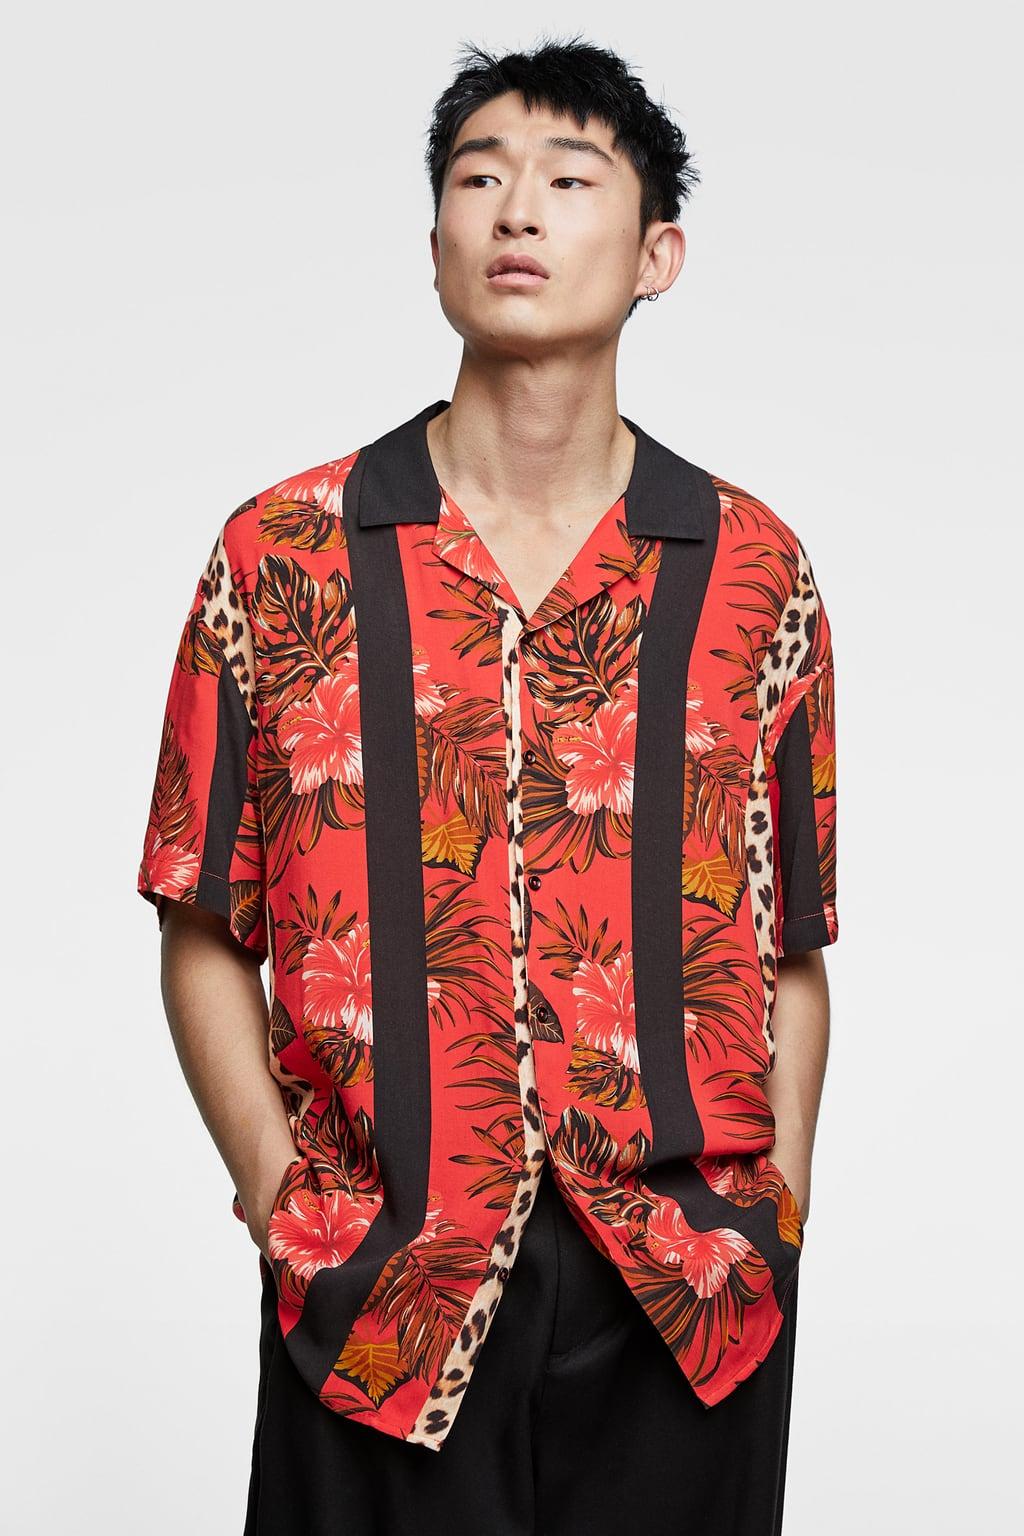 16 camisas para entrar na primavera com estilo e a mais barata só custa 9 euros